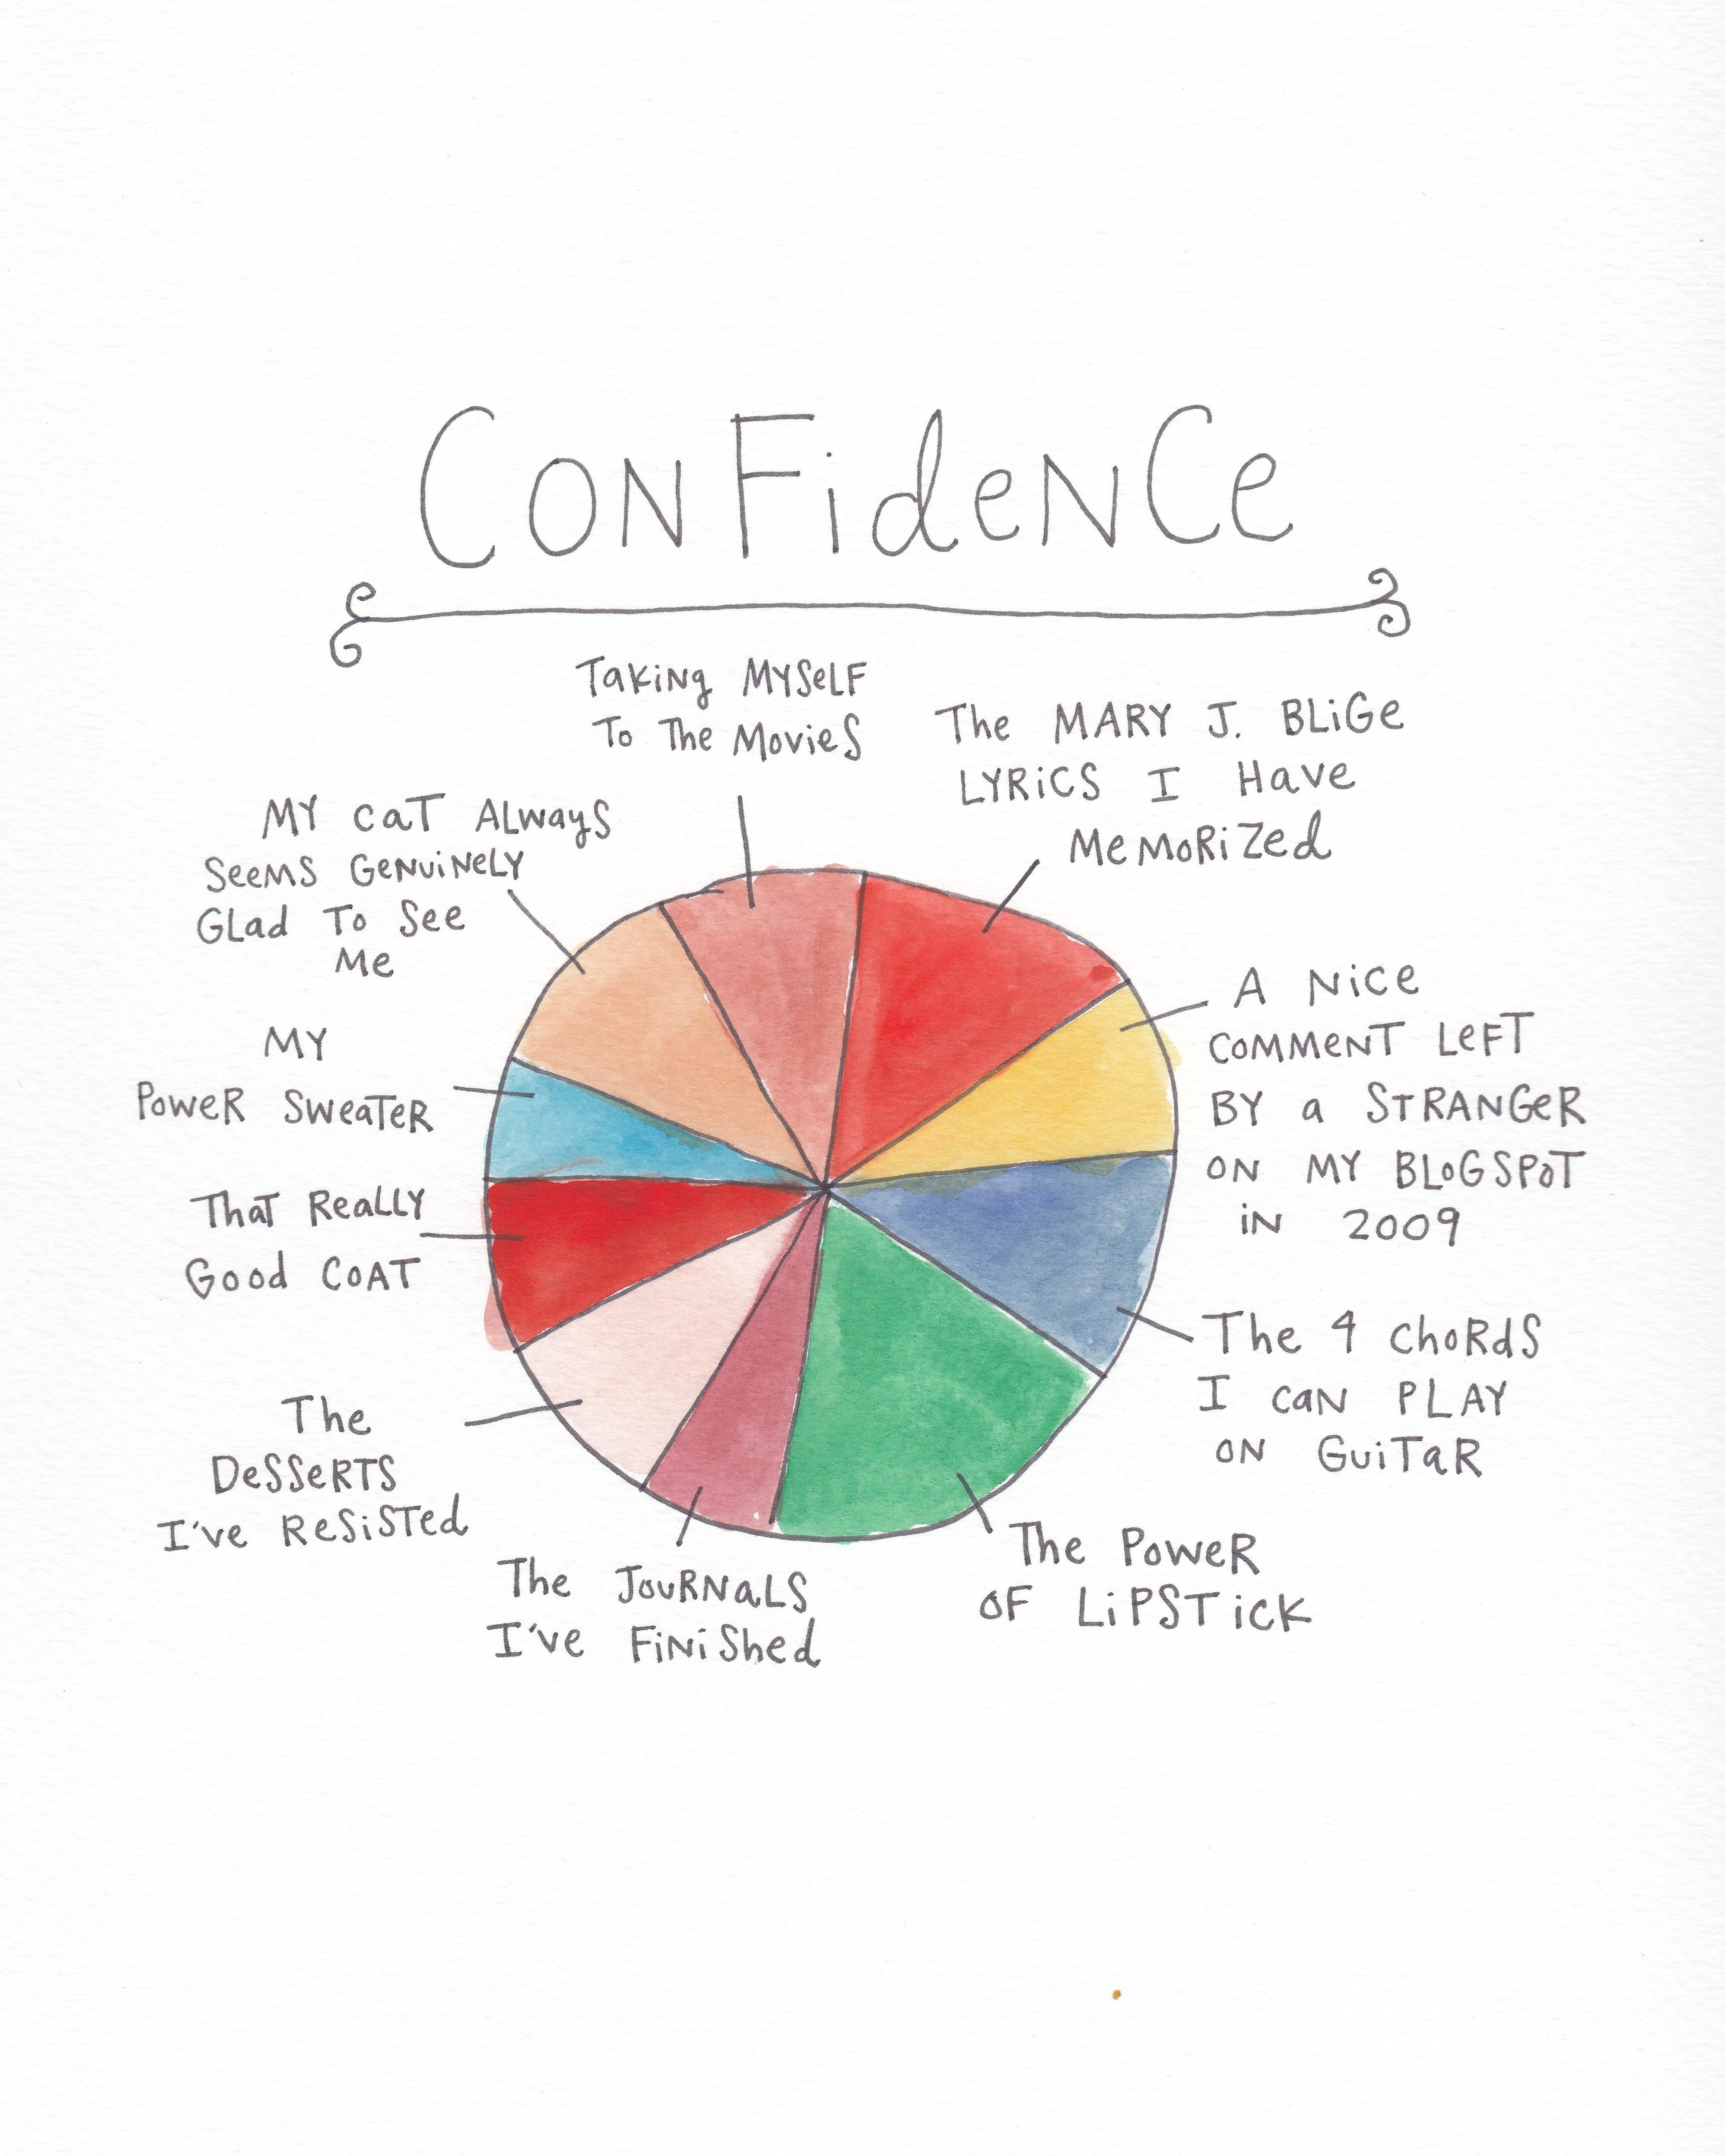 Confidence illustration by Mari Andrew